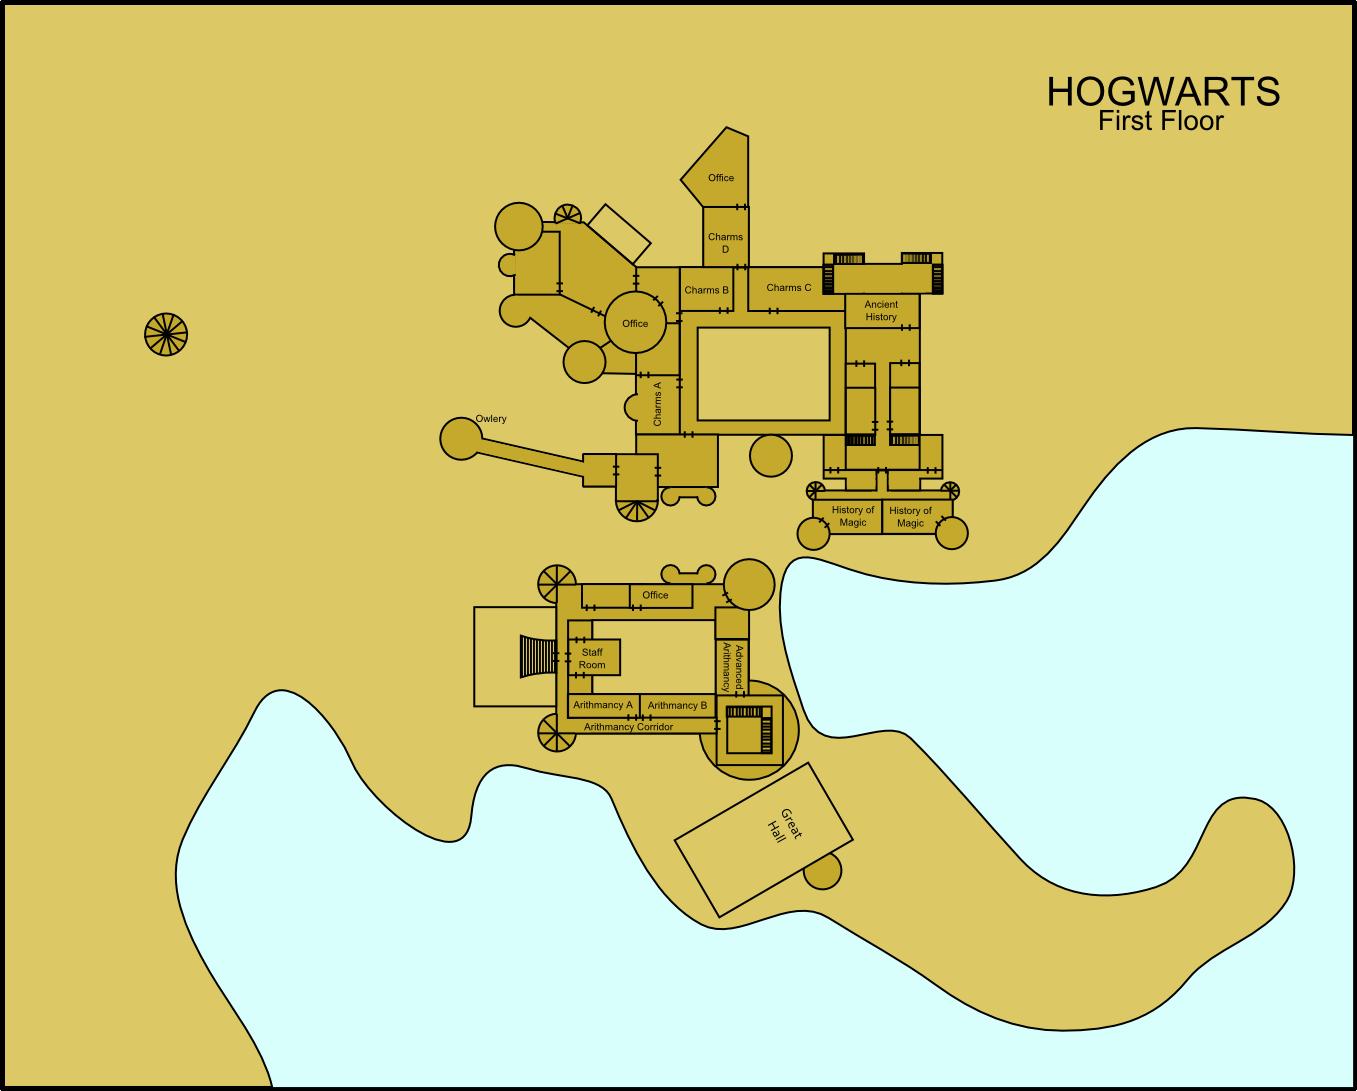 Hogwarts First Floor